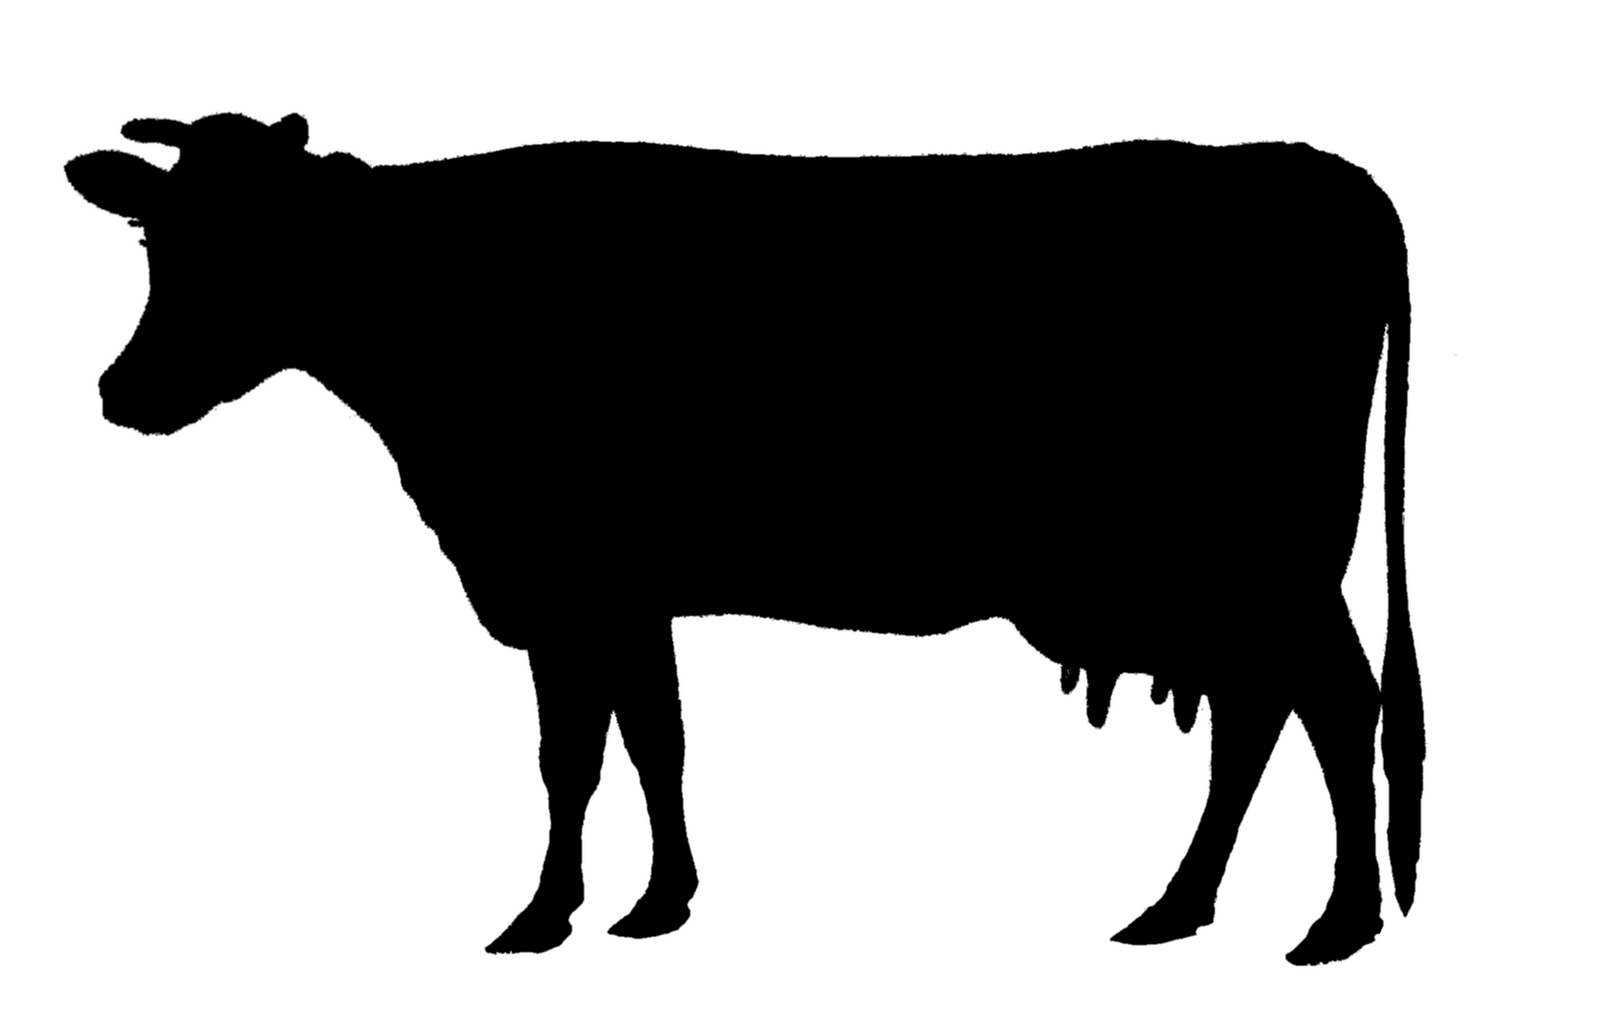 Farm animal silhouettes clipart clip art free download Free Farm Animals Silhouette, Download Free Clip Art, Free Clip Art ... clip art free download